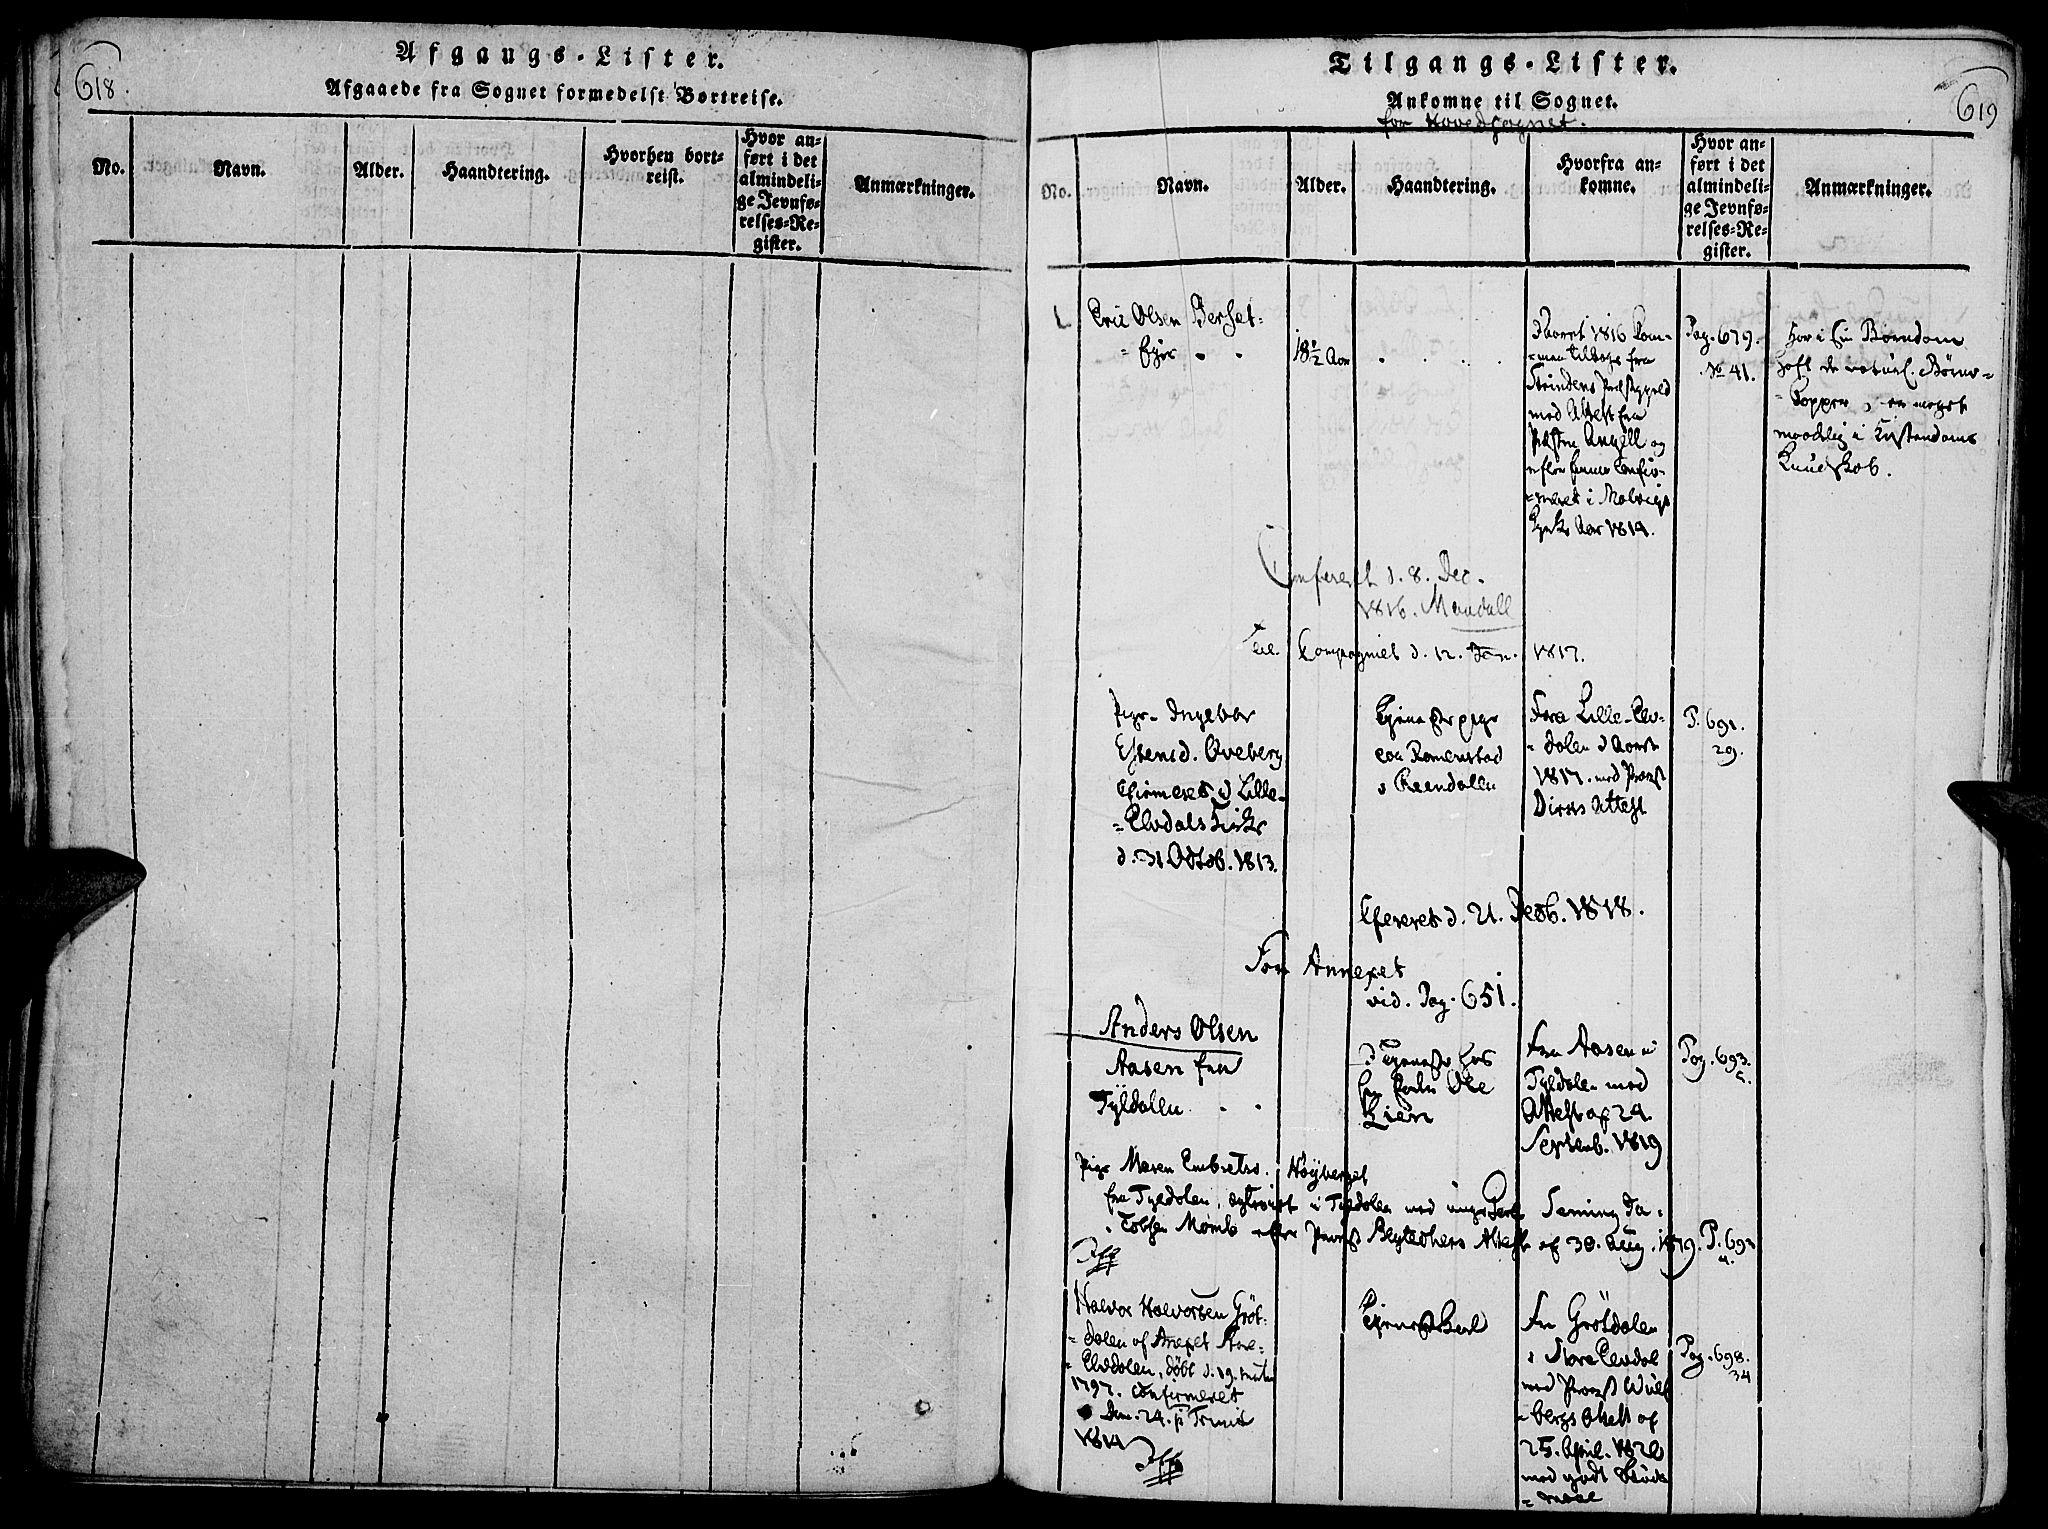 SAH, Rendalen prestekontor, H/Ha/Haa/L0003: Ministerialbok nr. 3, 1815-1829, s. 618-619